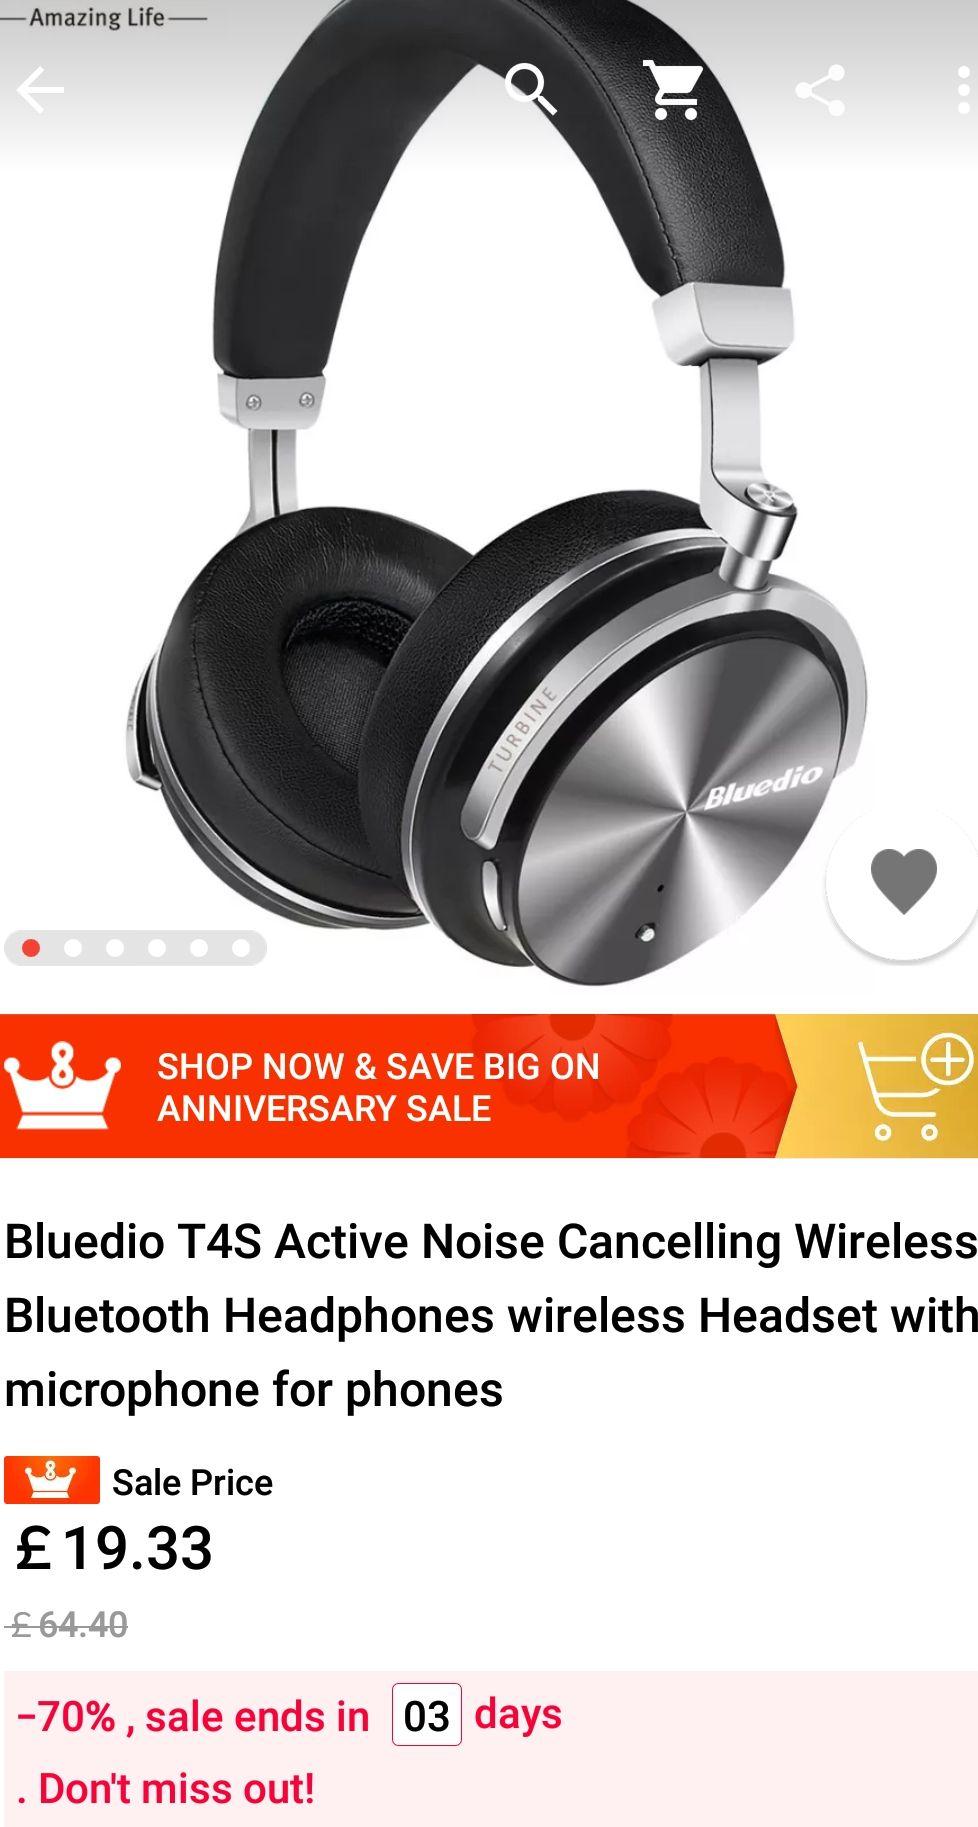 Bluedio T4S wireless headphones £19.33 @ Aliexpress via app